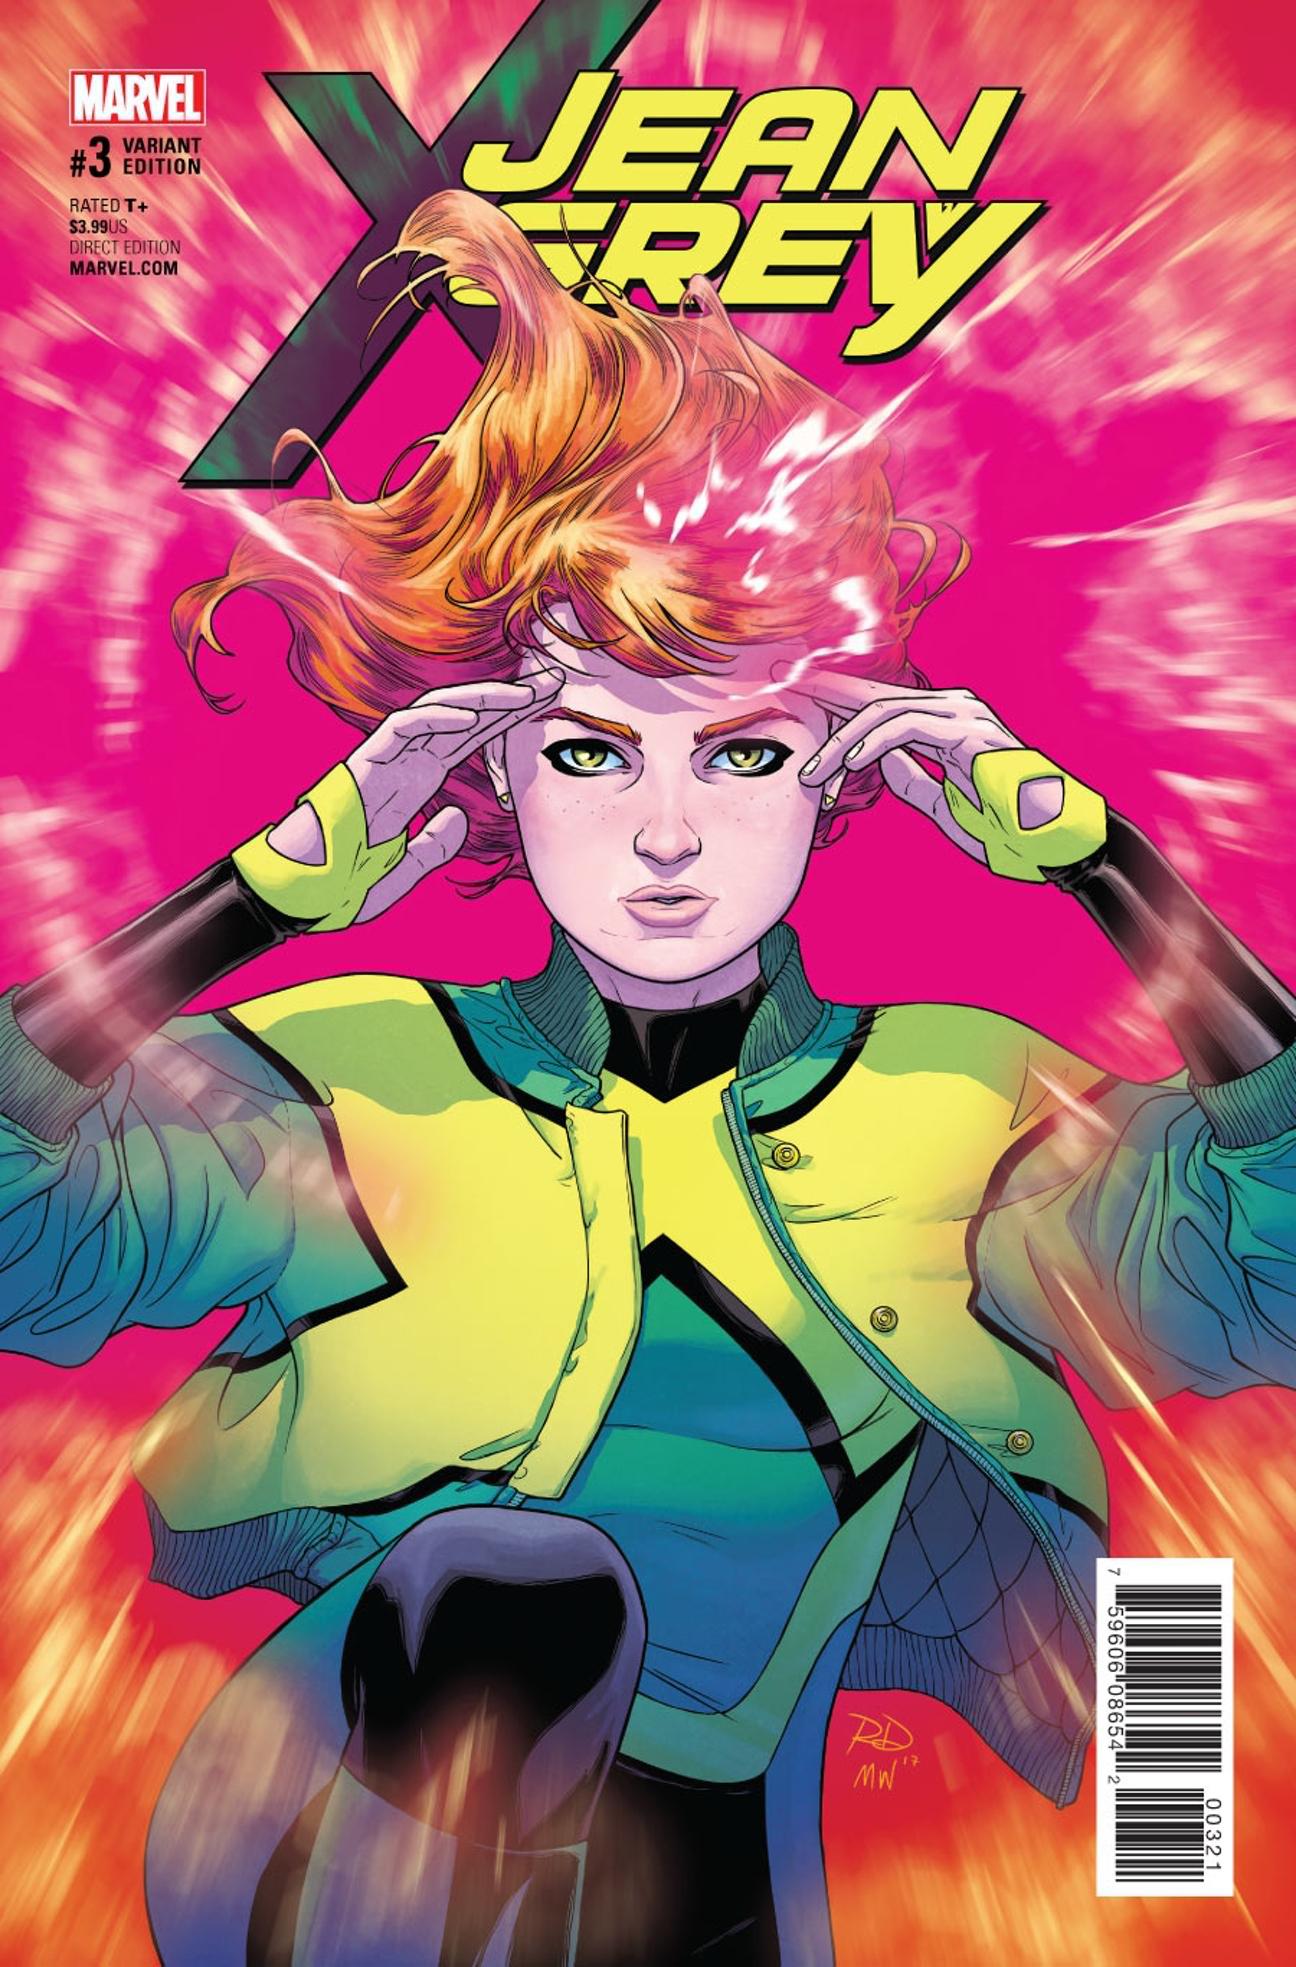 Russell Dauterman - Jean Grey #3 variant cover